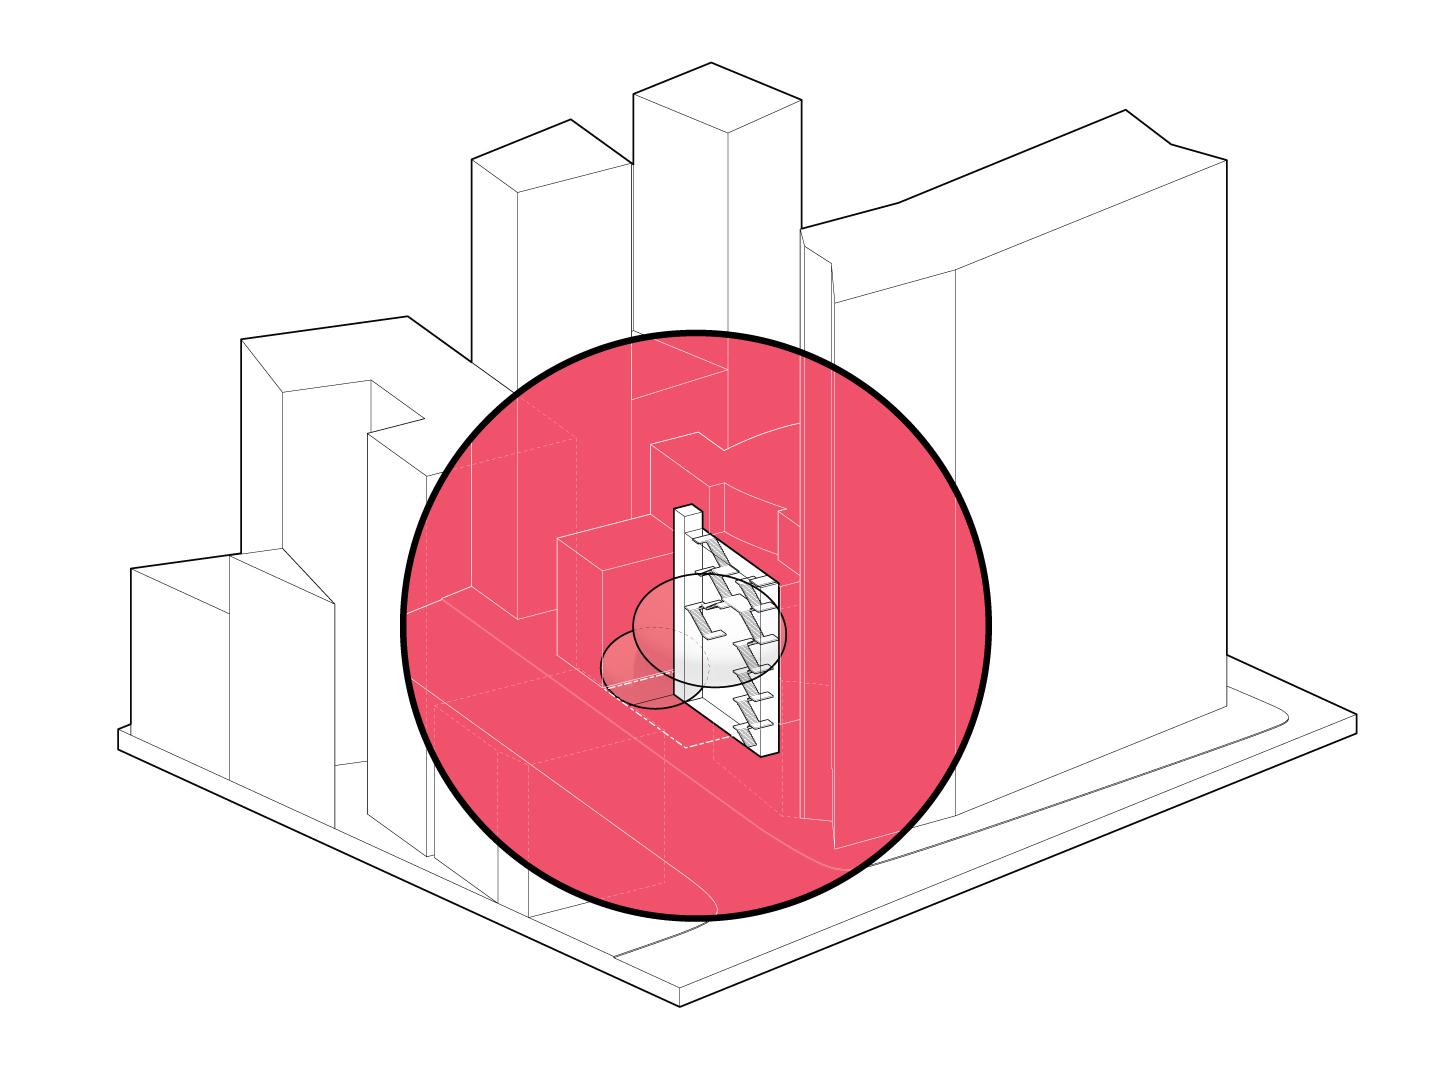 Circulation Core